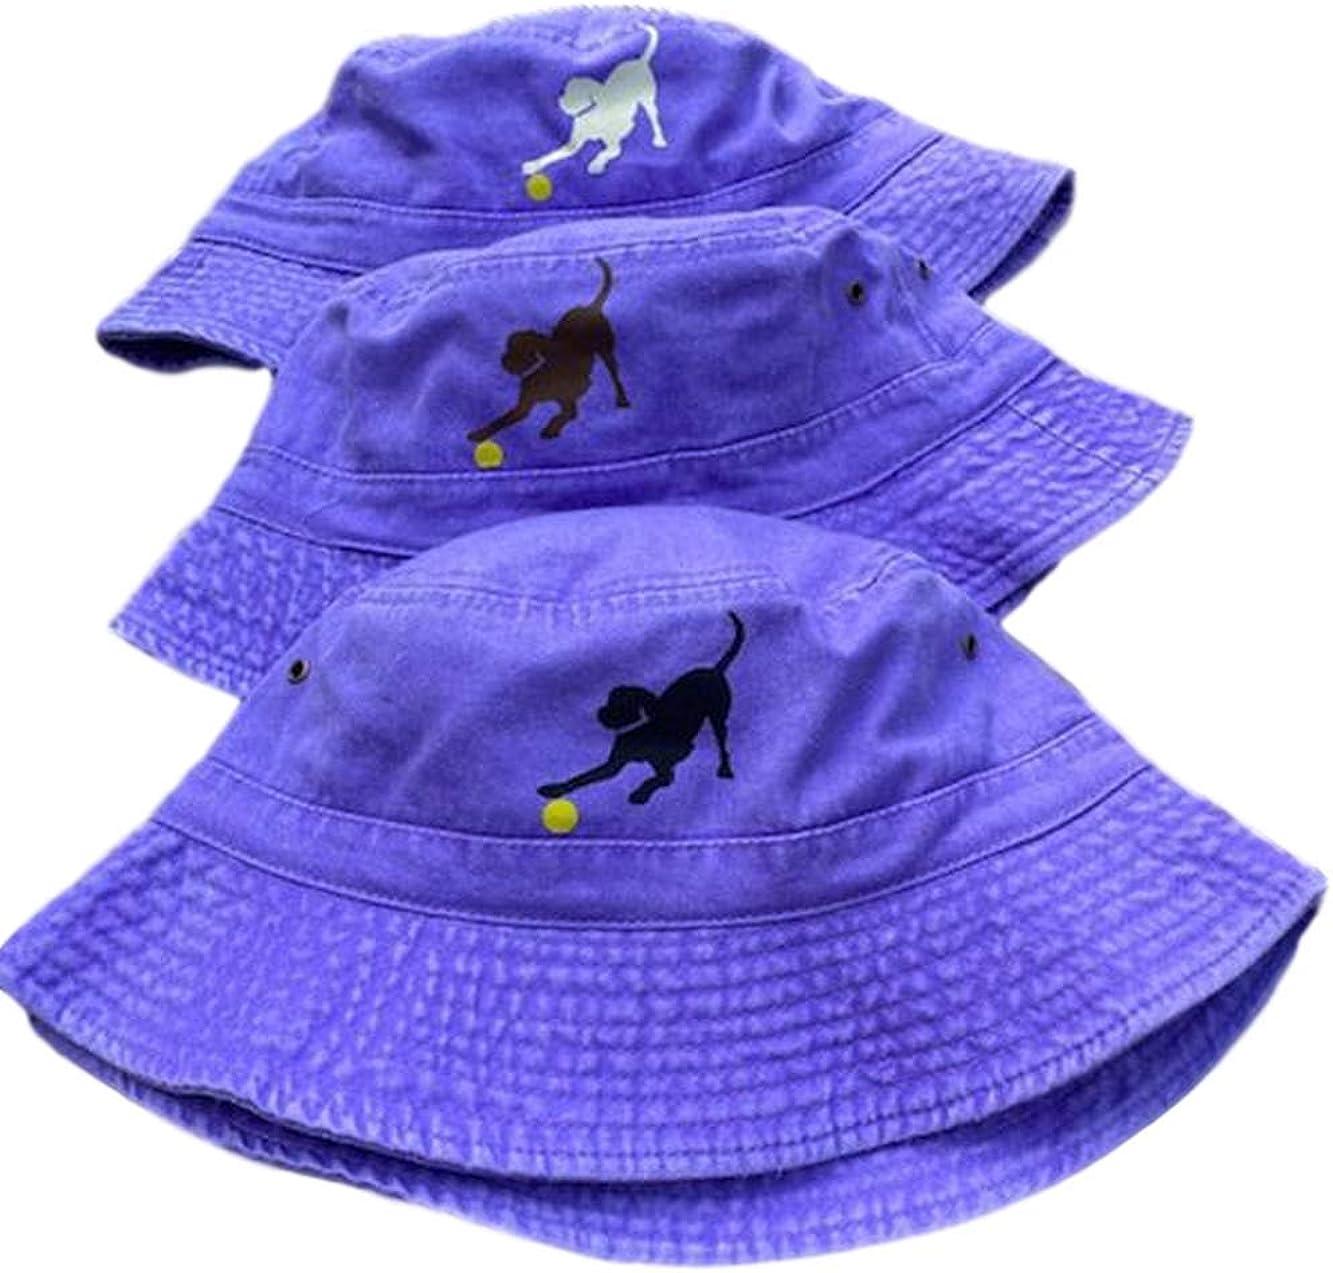 JUS LABS Adult Labrador Bucket Hats - Unisex - 100% Washed Cotton - Yellow/Black/Chocolate Lab - Purple